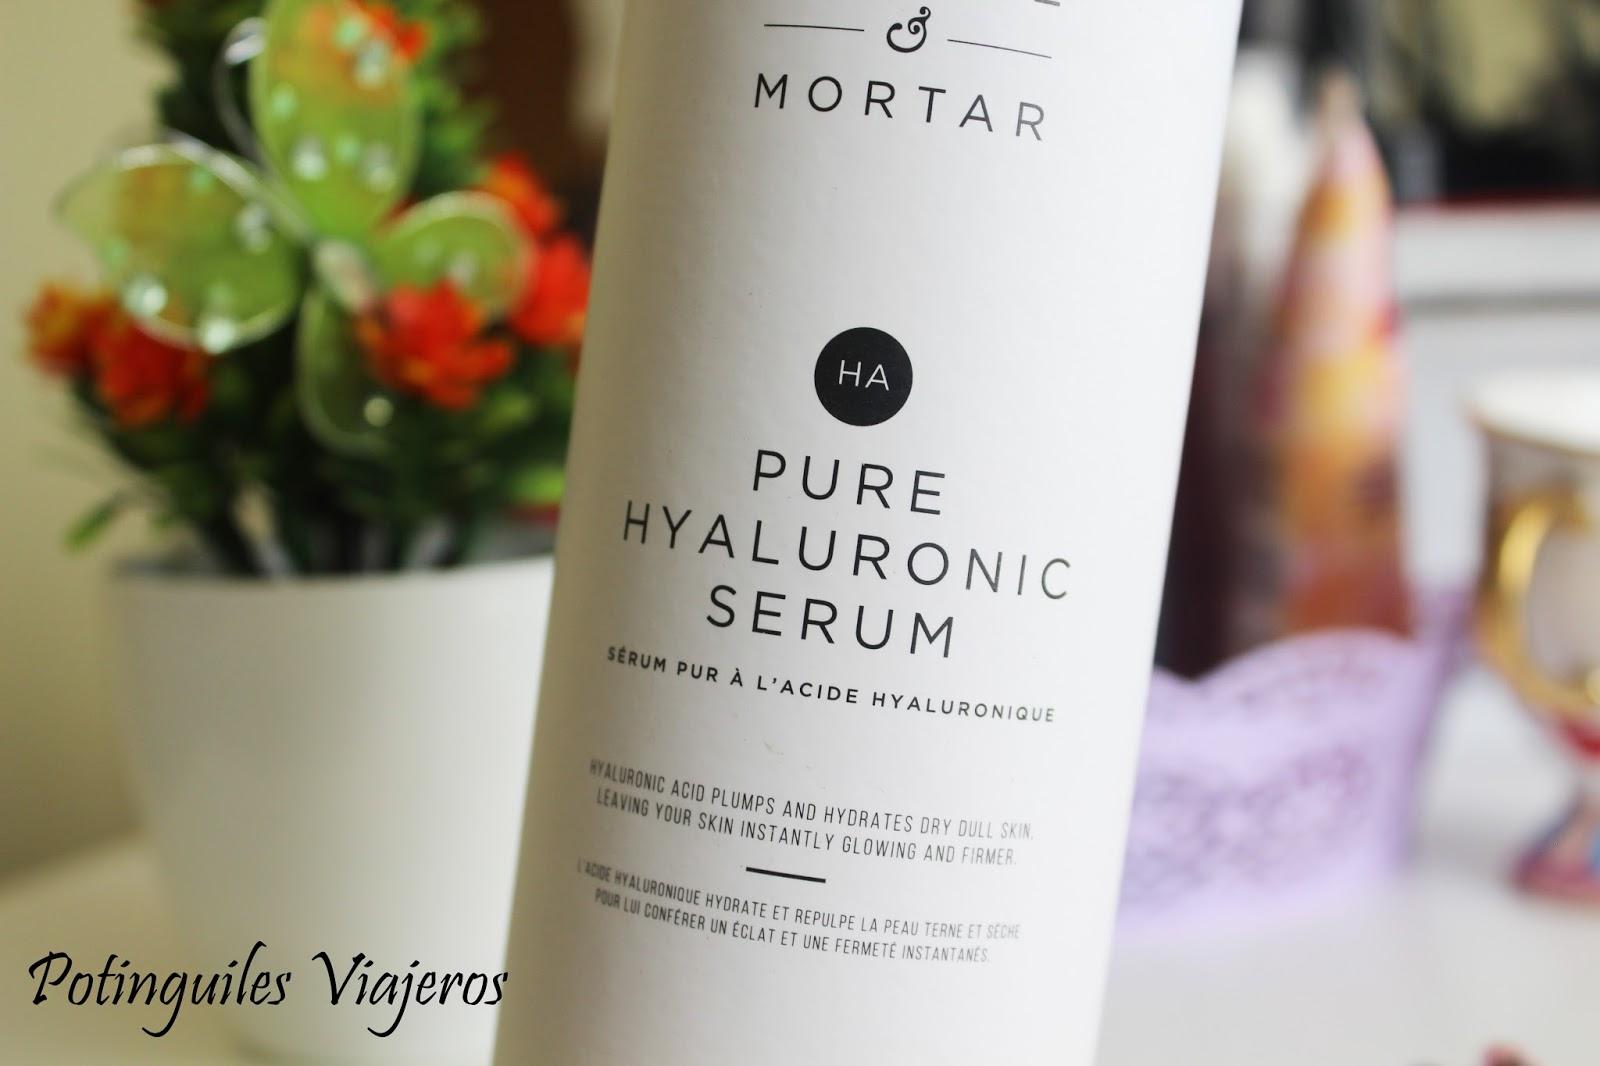 Potinguiles Viajeros : Serum Pure Hyaluronic de Pestle